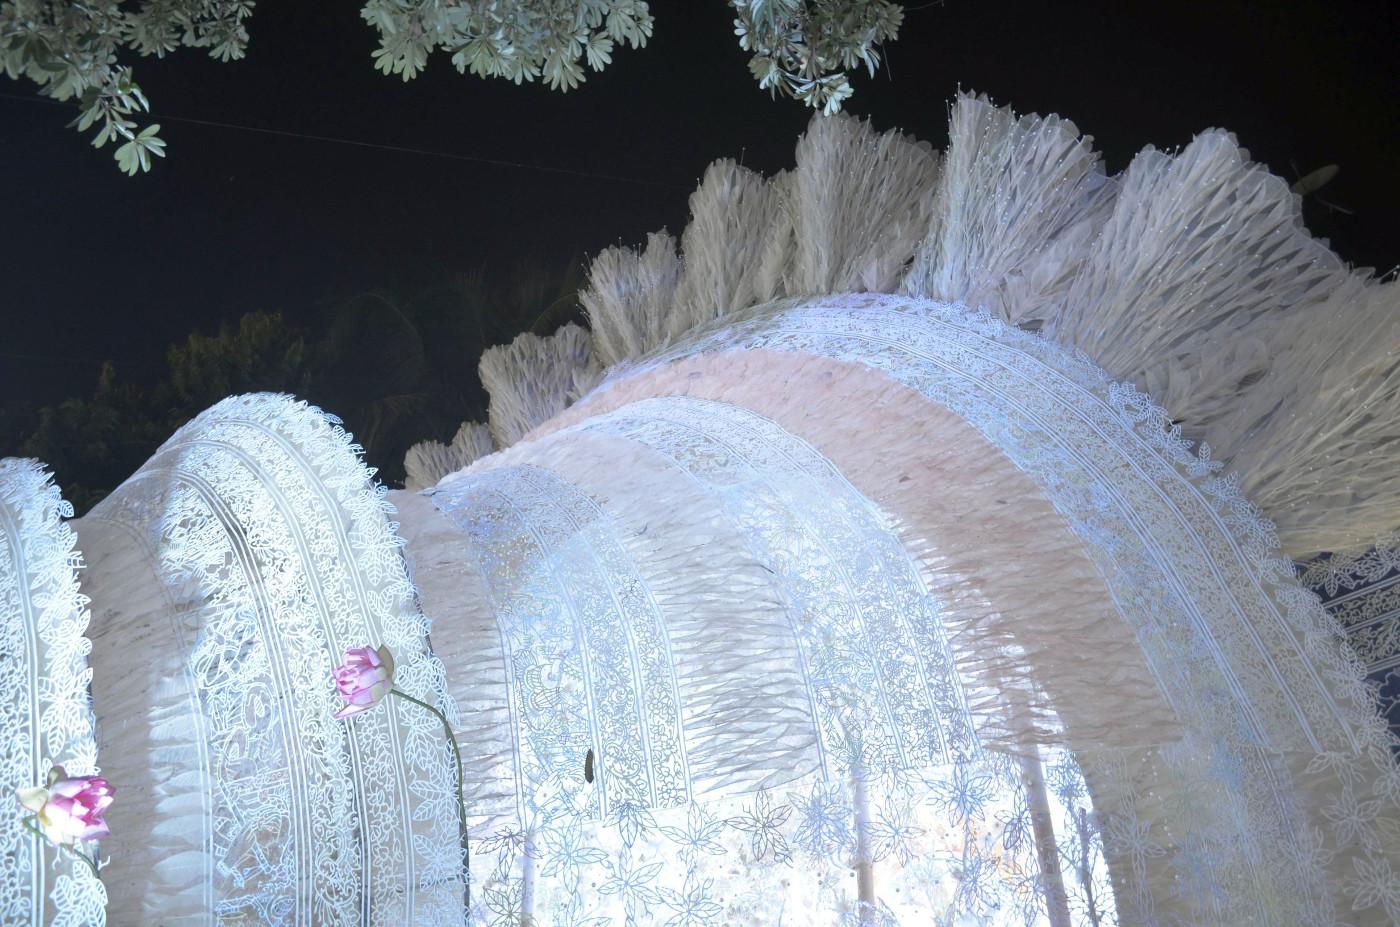 Giant white cone under chhatim tree, Kolkata Durga Puja 2015